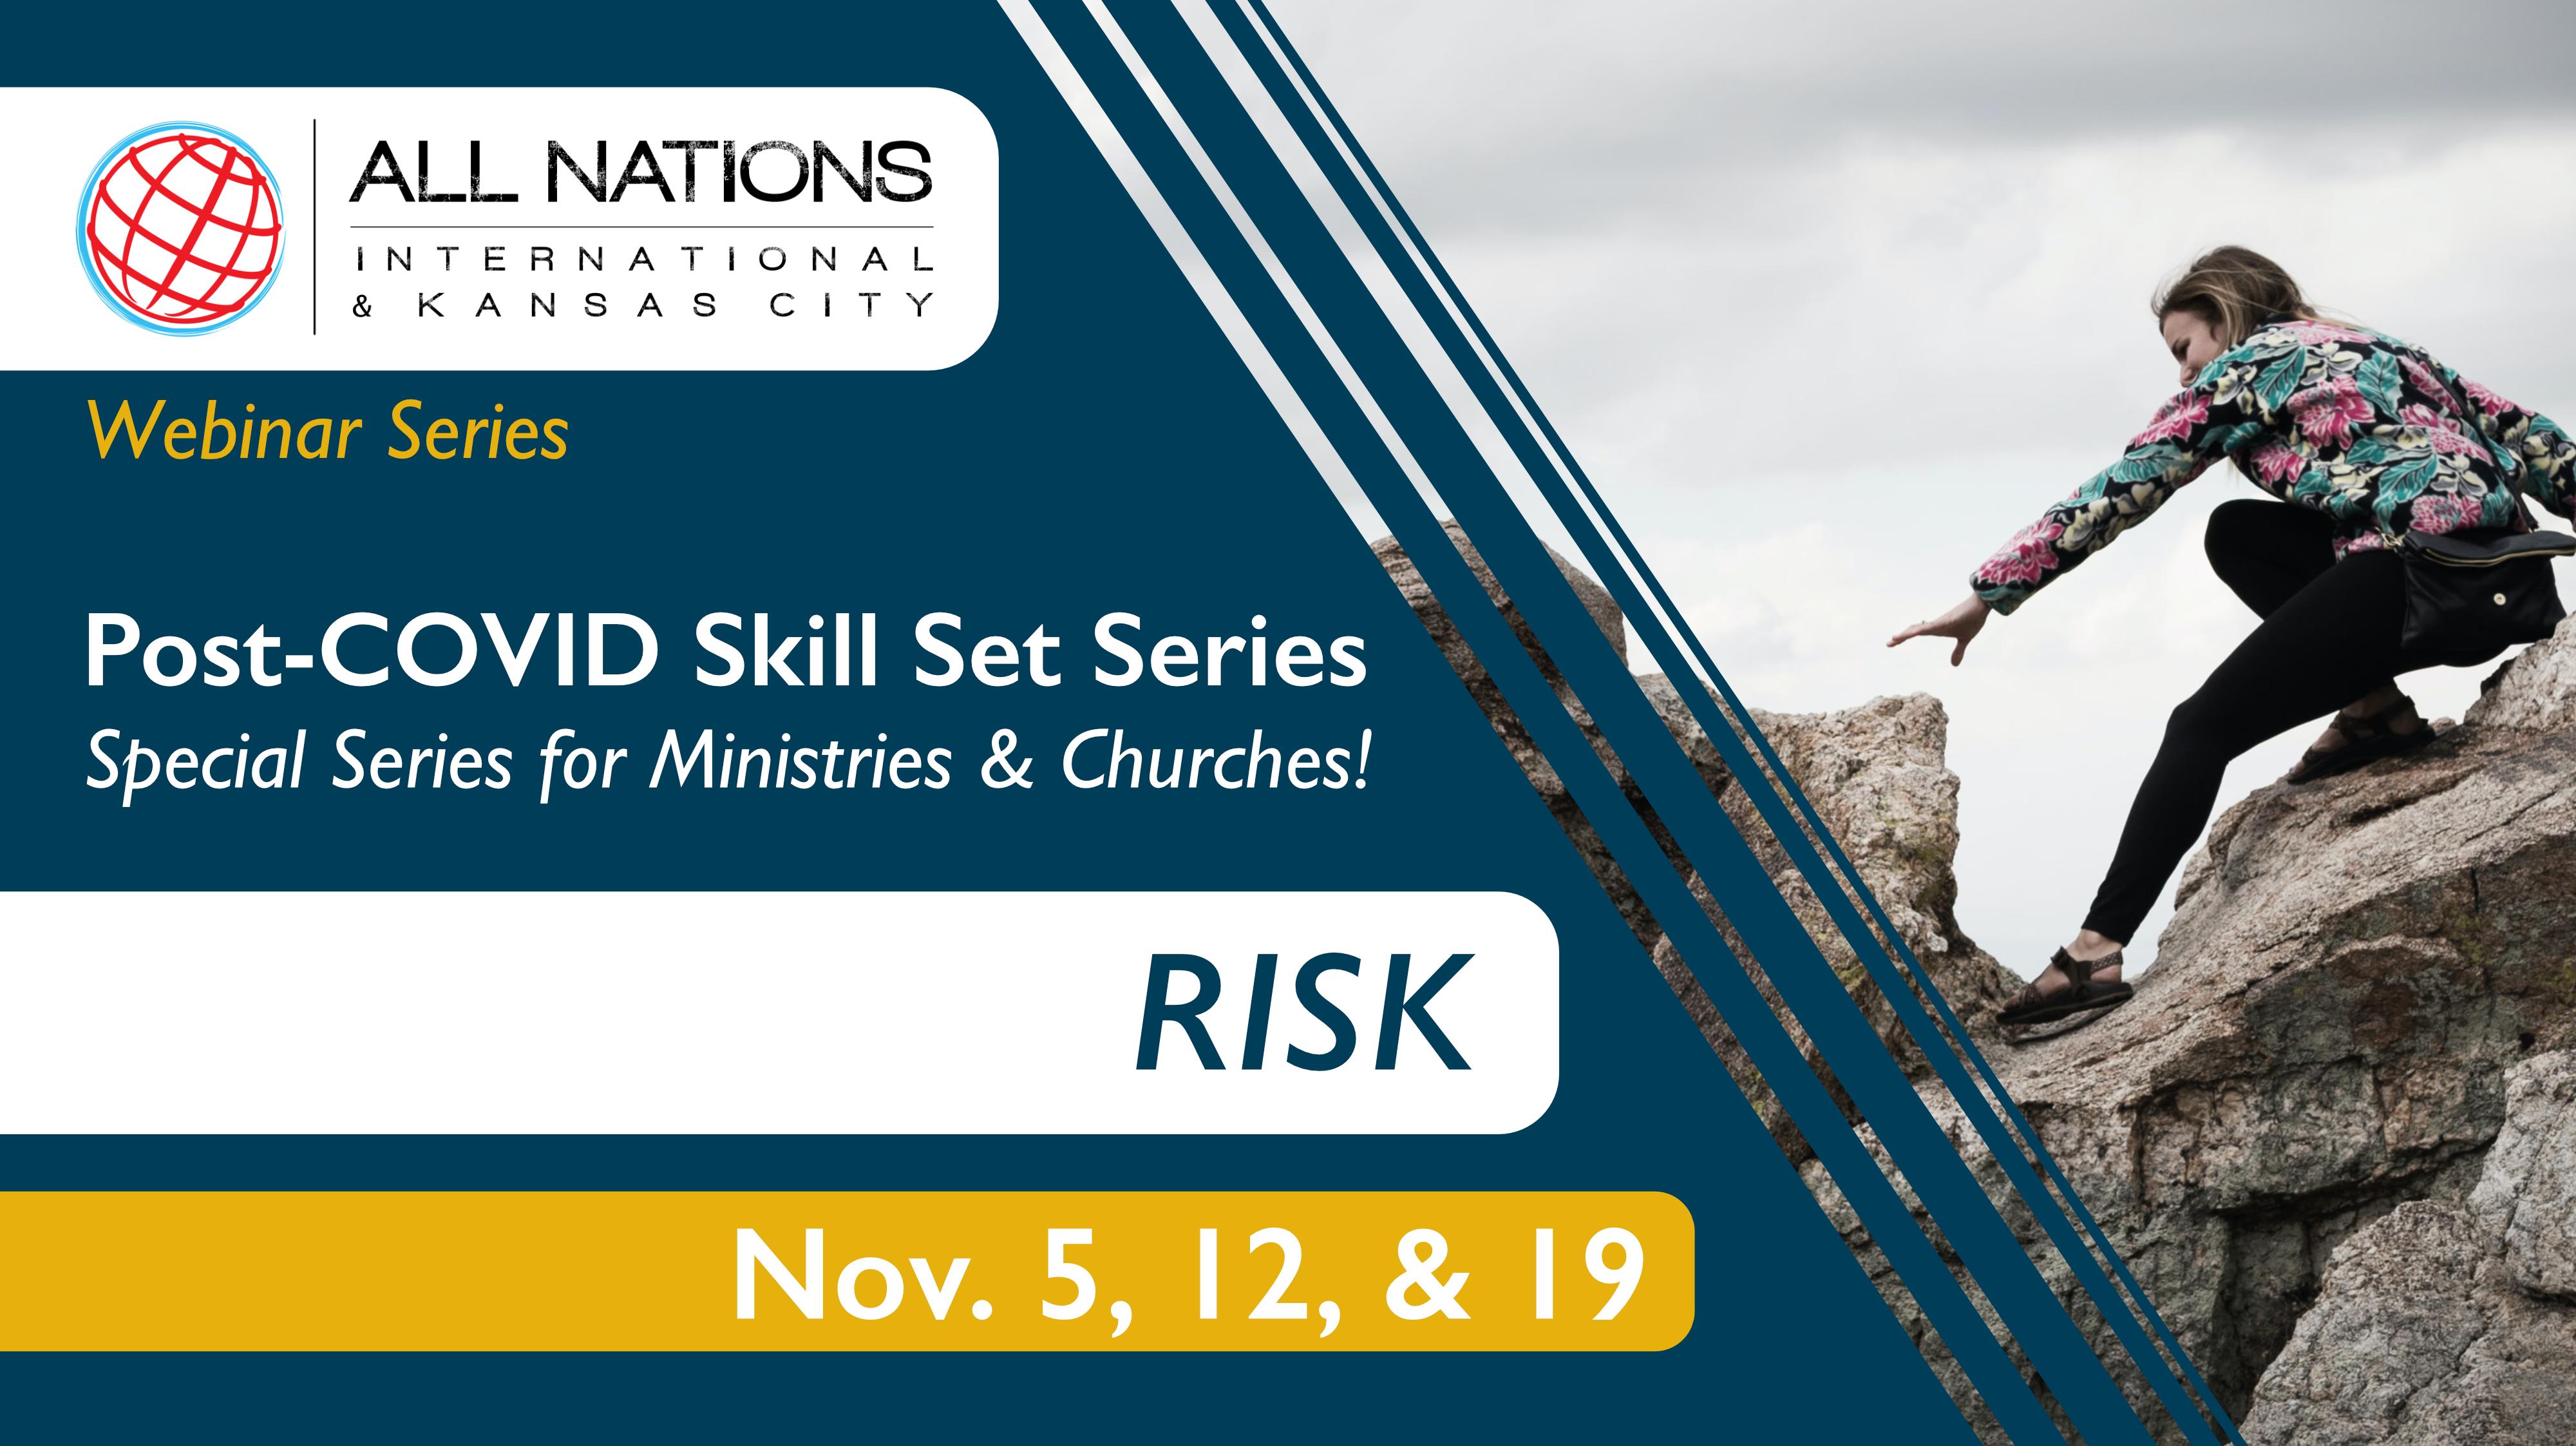 Risk: Post-COVID Skills Online Series, Topic 2